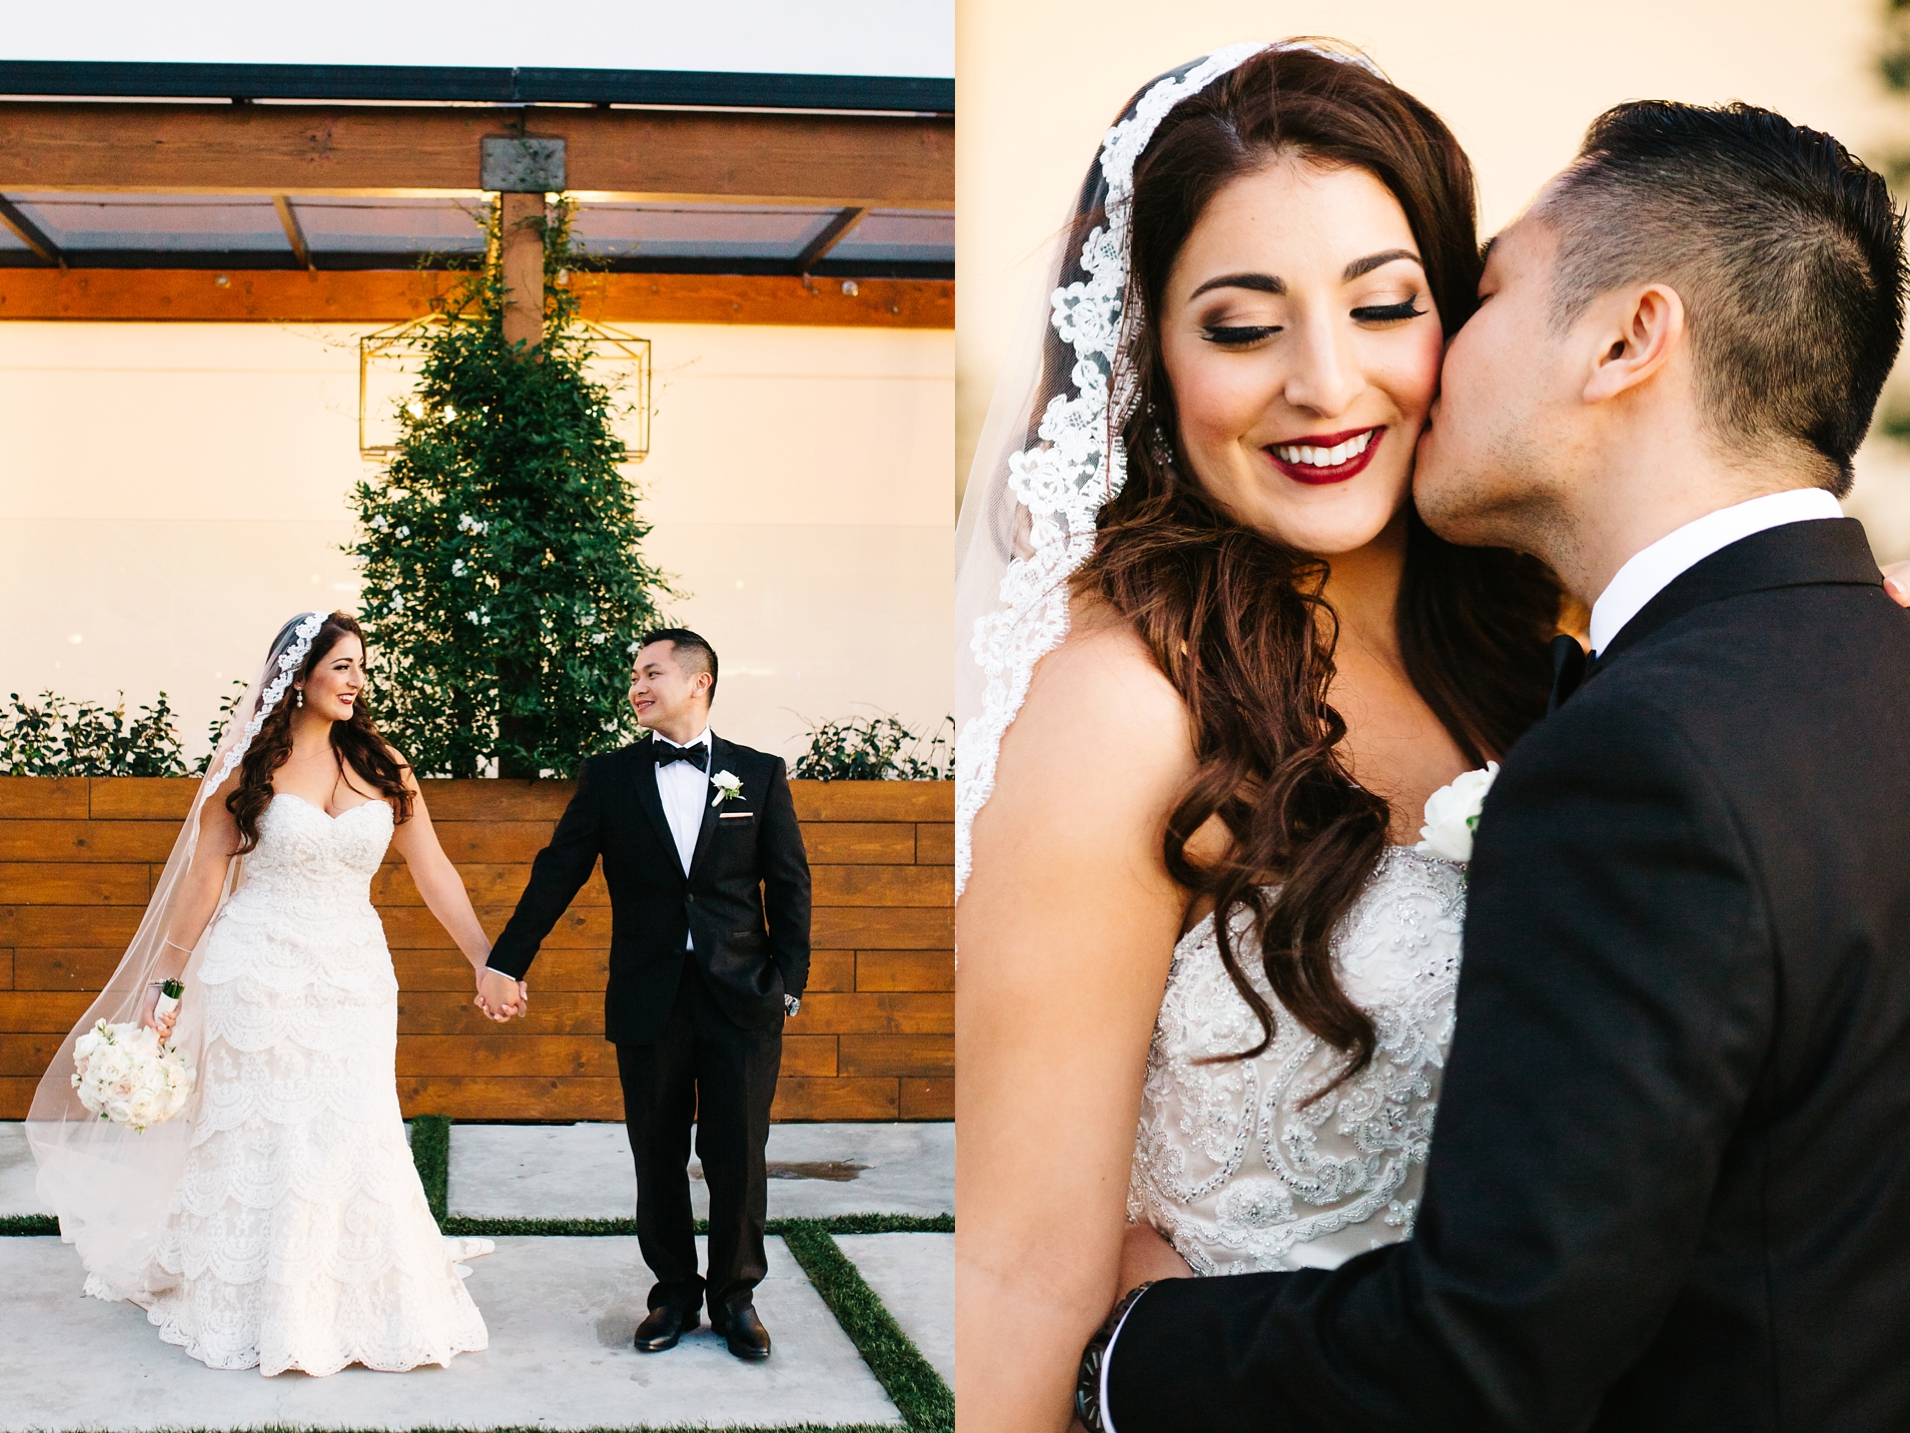 Venue by Three Petals Wedding-Huntington Beach Wedding Photographer-Brittney Hannon Photograhy